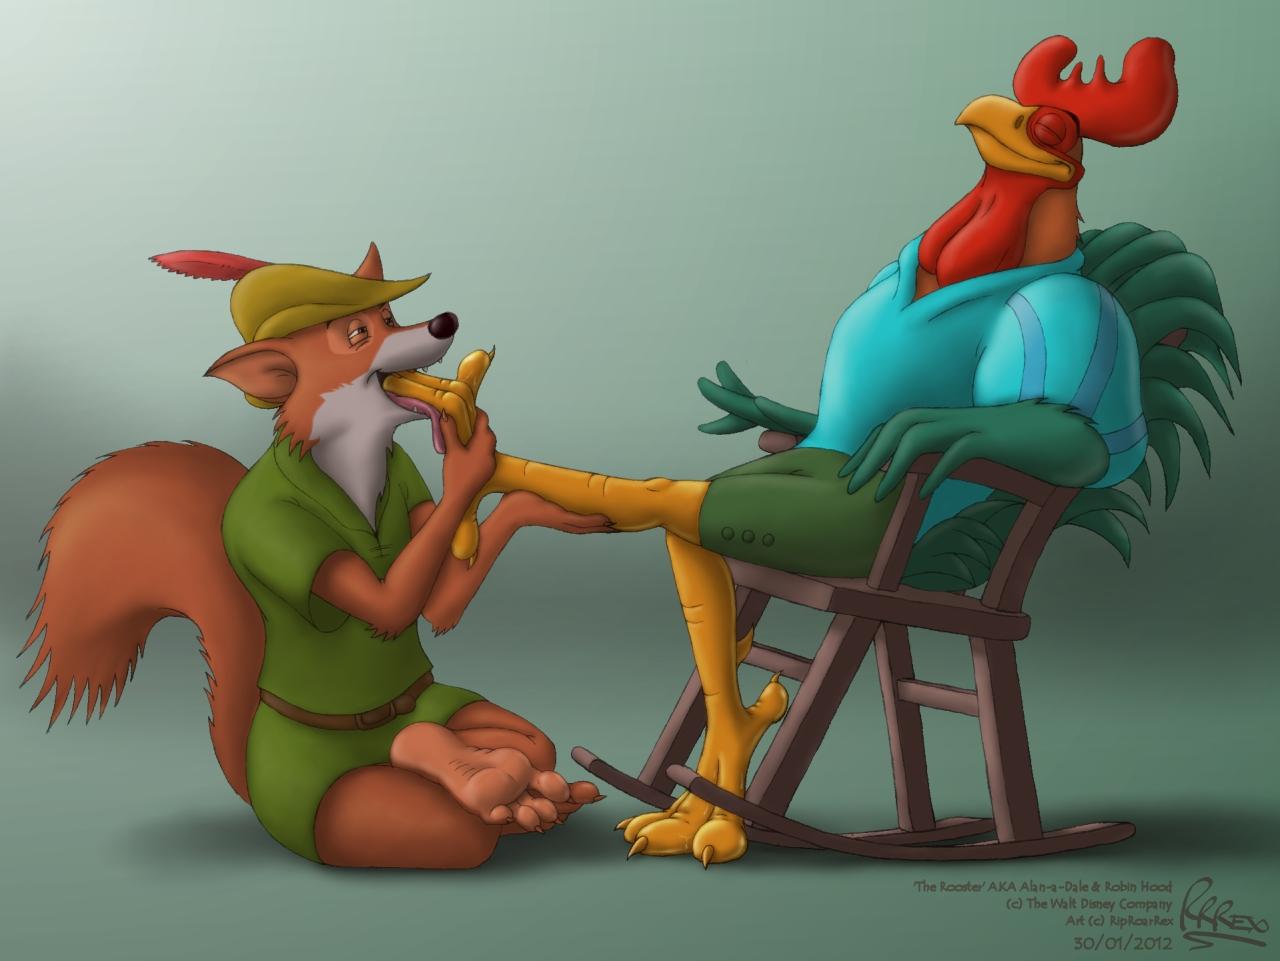 Fox Cartoons That Make You Tingly Furry Newsdump 10-3-14  Dogpatch Press-6349